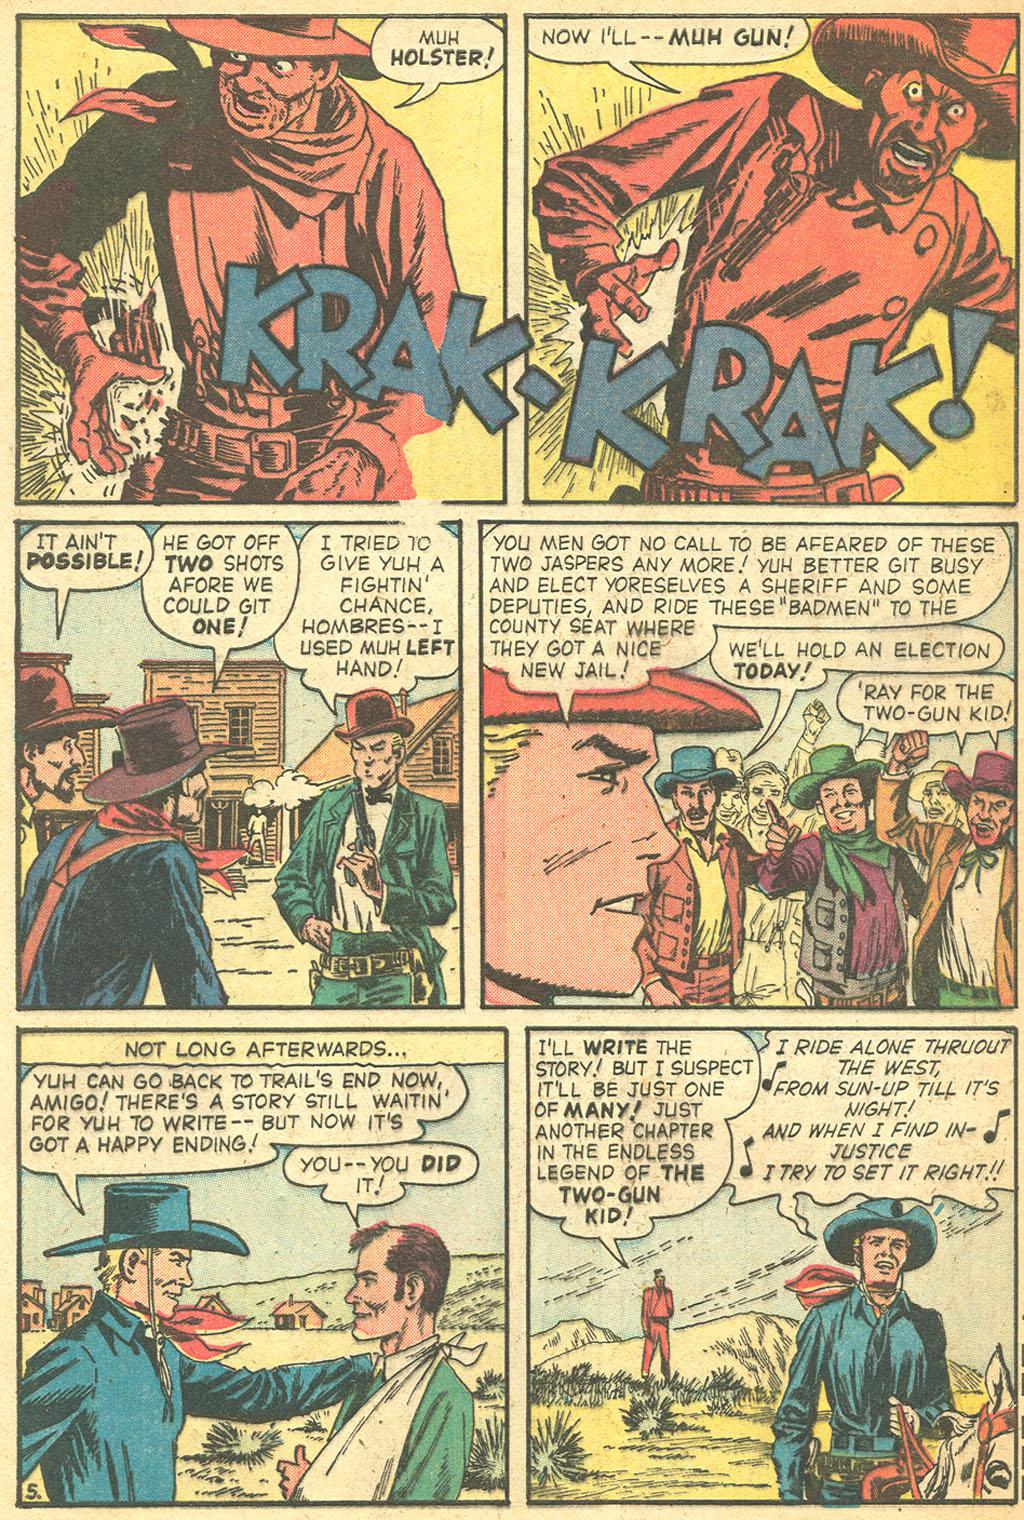 Read online Two-Gun Kid comic -  Issue #50 - 32